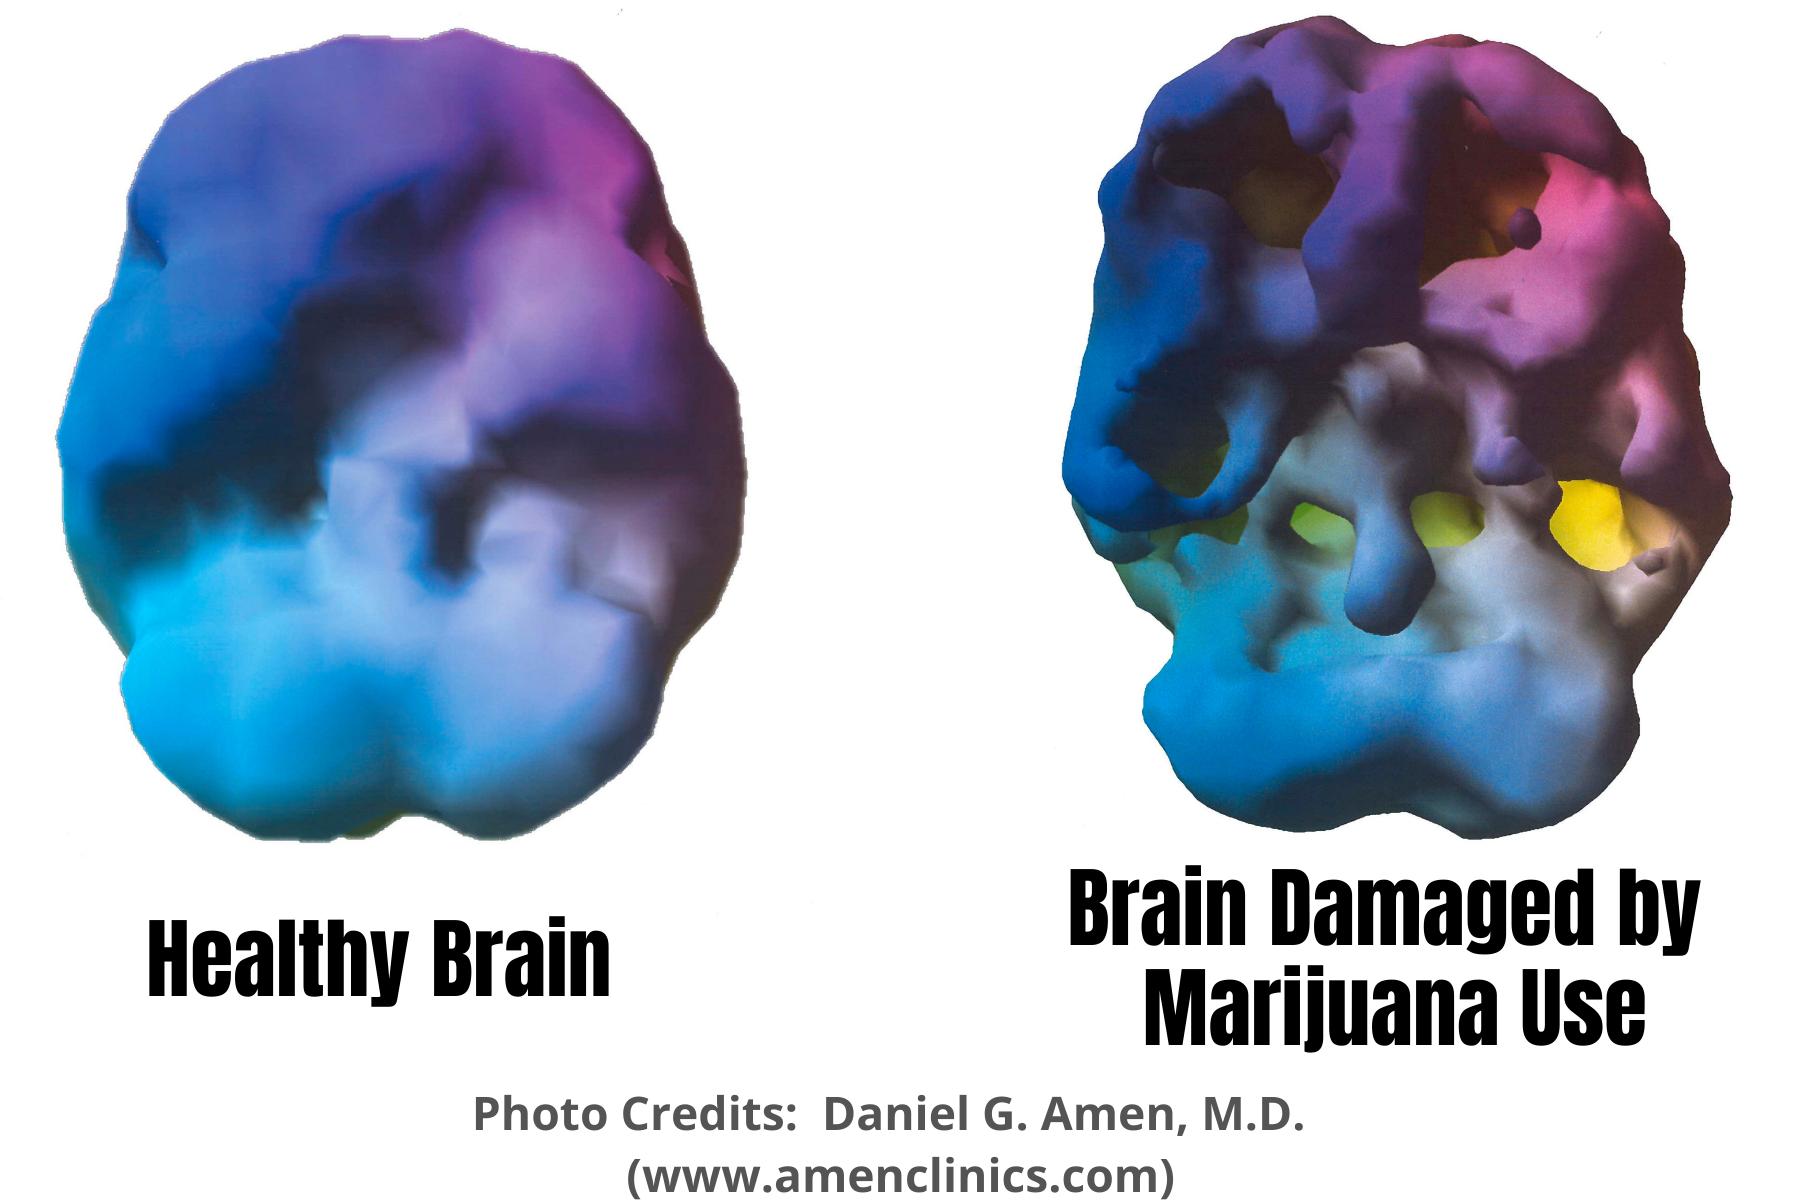 Healthy BrainBrain Damaged by Marijuana Scans